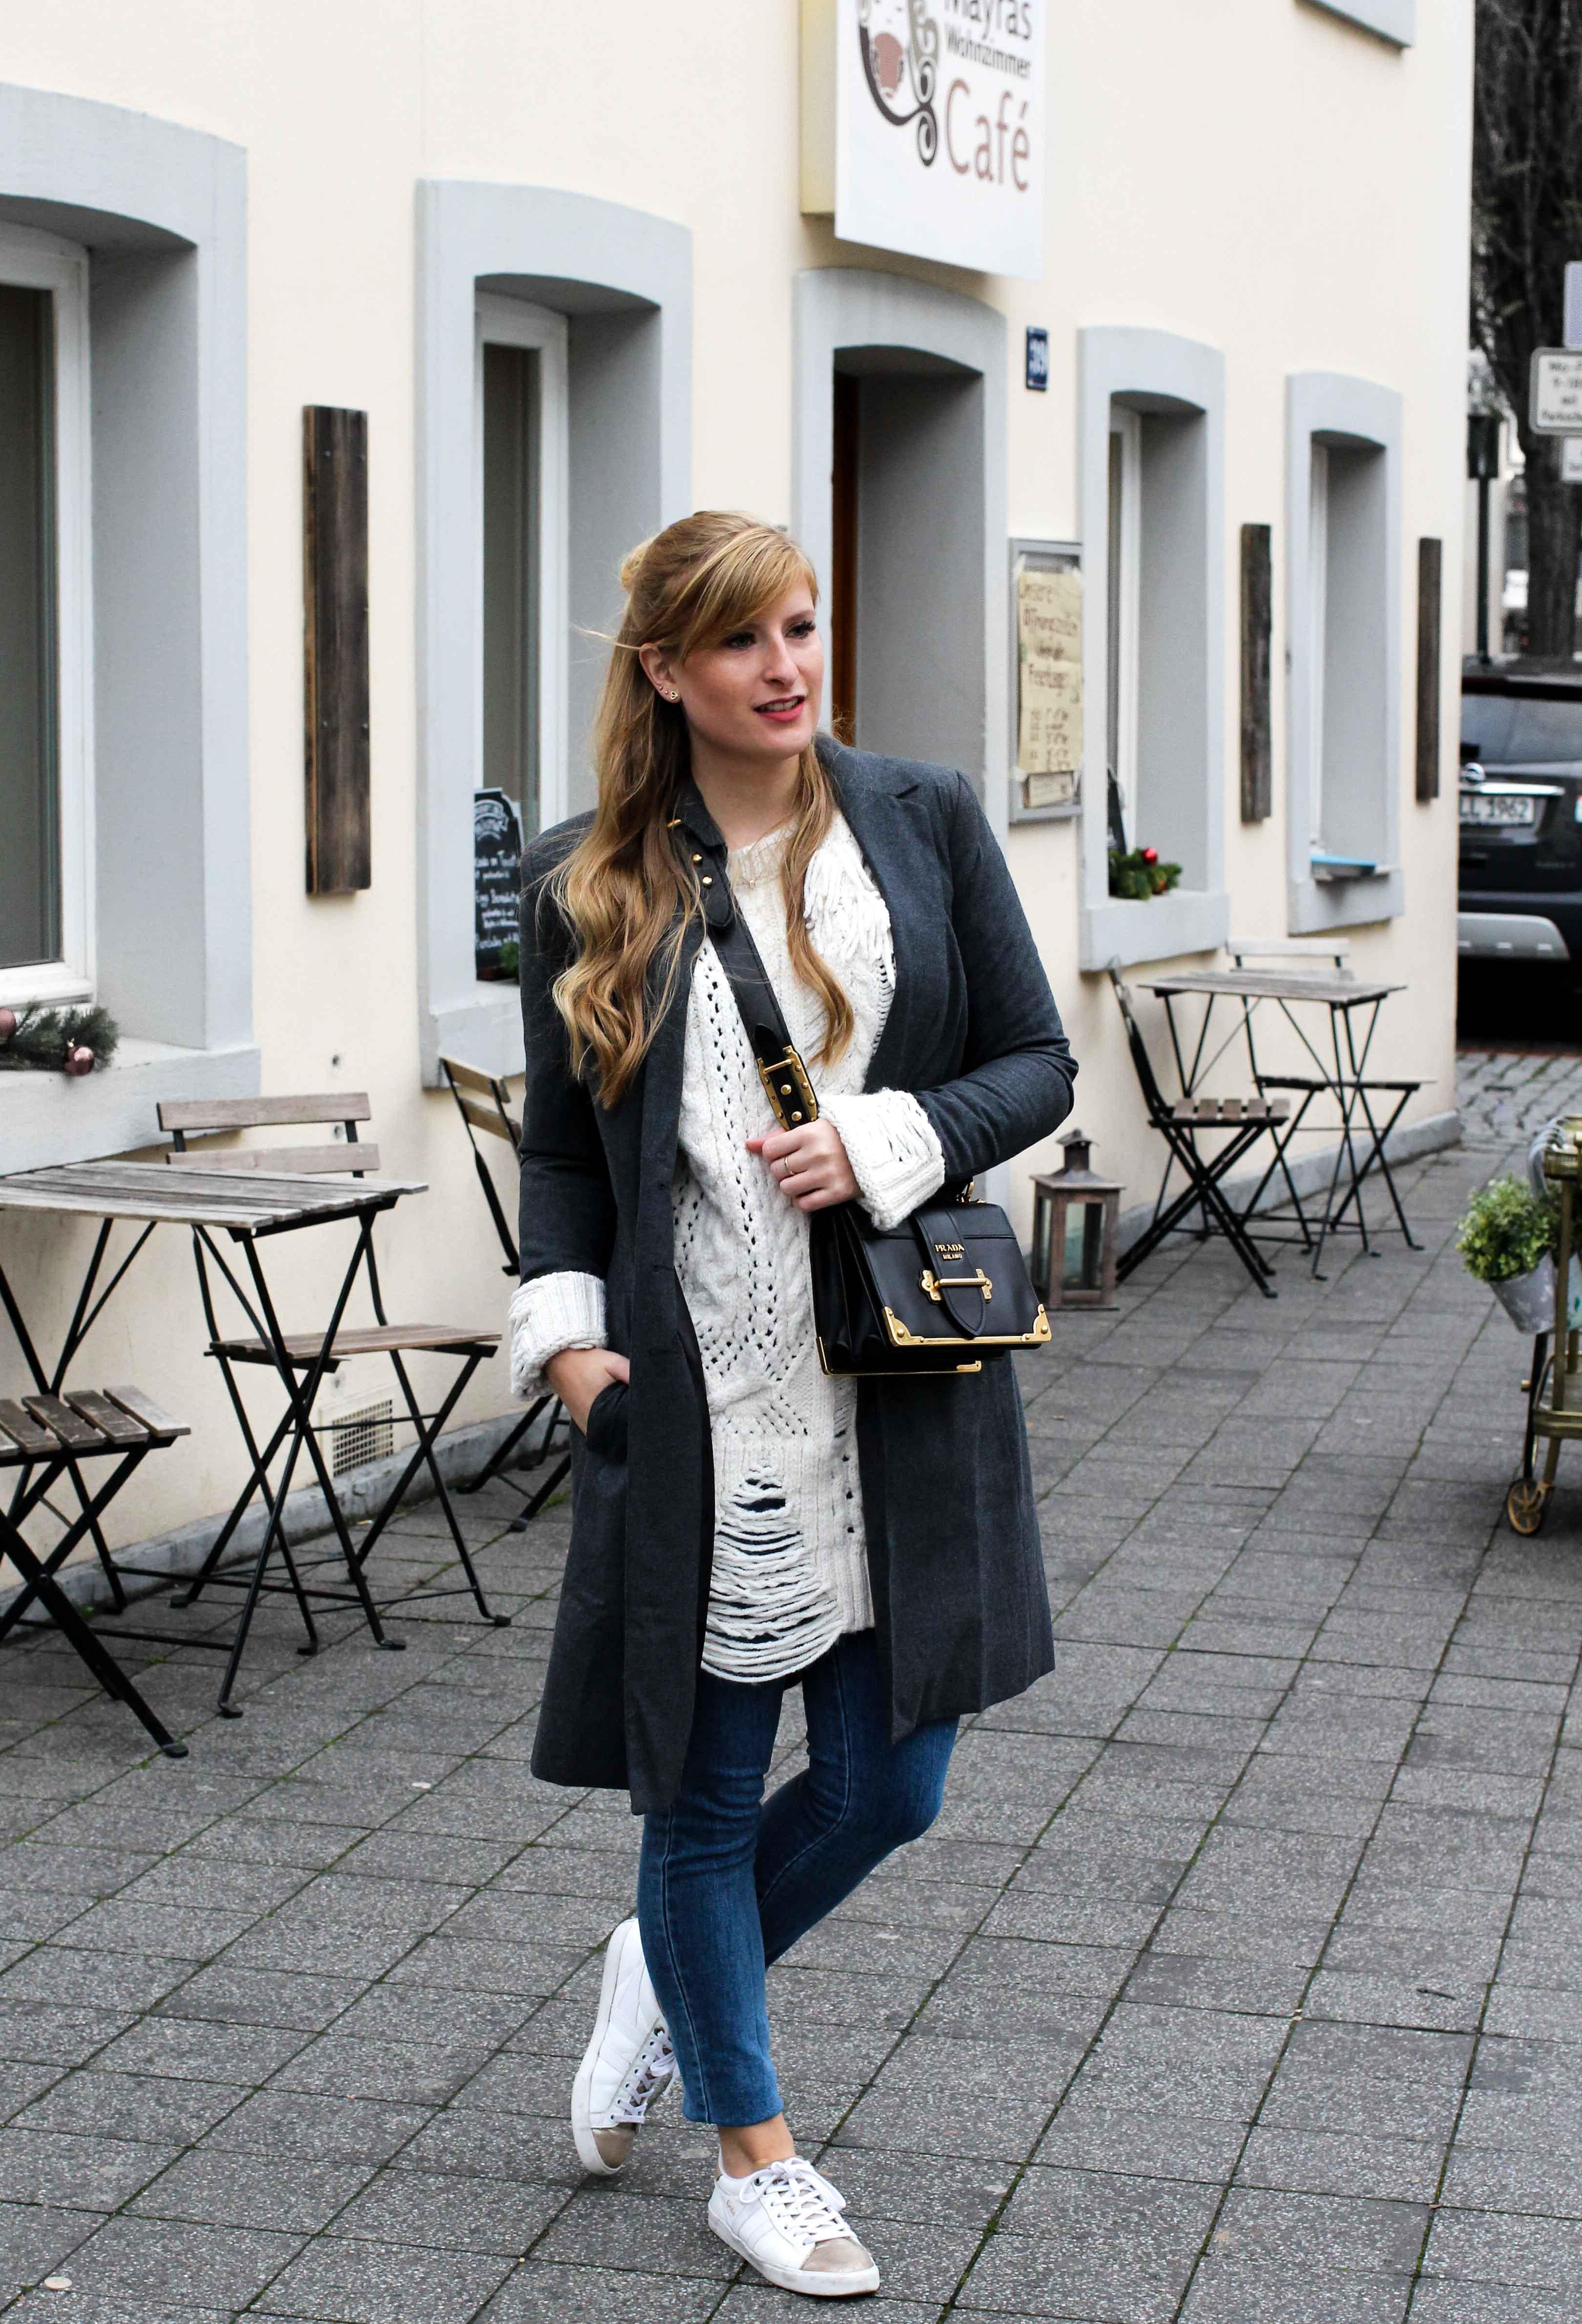 Outfit Zara Wollpullover kombinieren weiße Sneaker Blue Jeans NAKD Winterlook Prada Cahier Tasche Classy Cozy Modeblog Bonn streetstyle 6